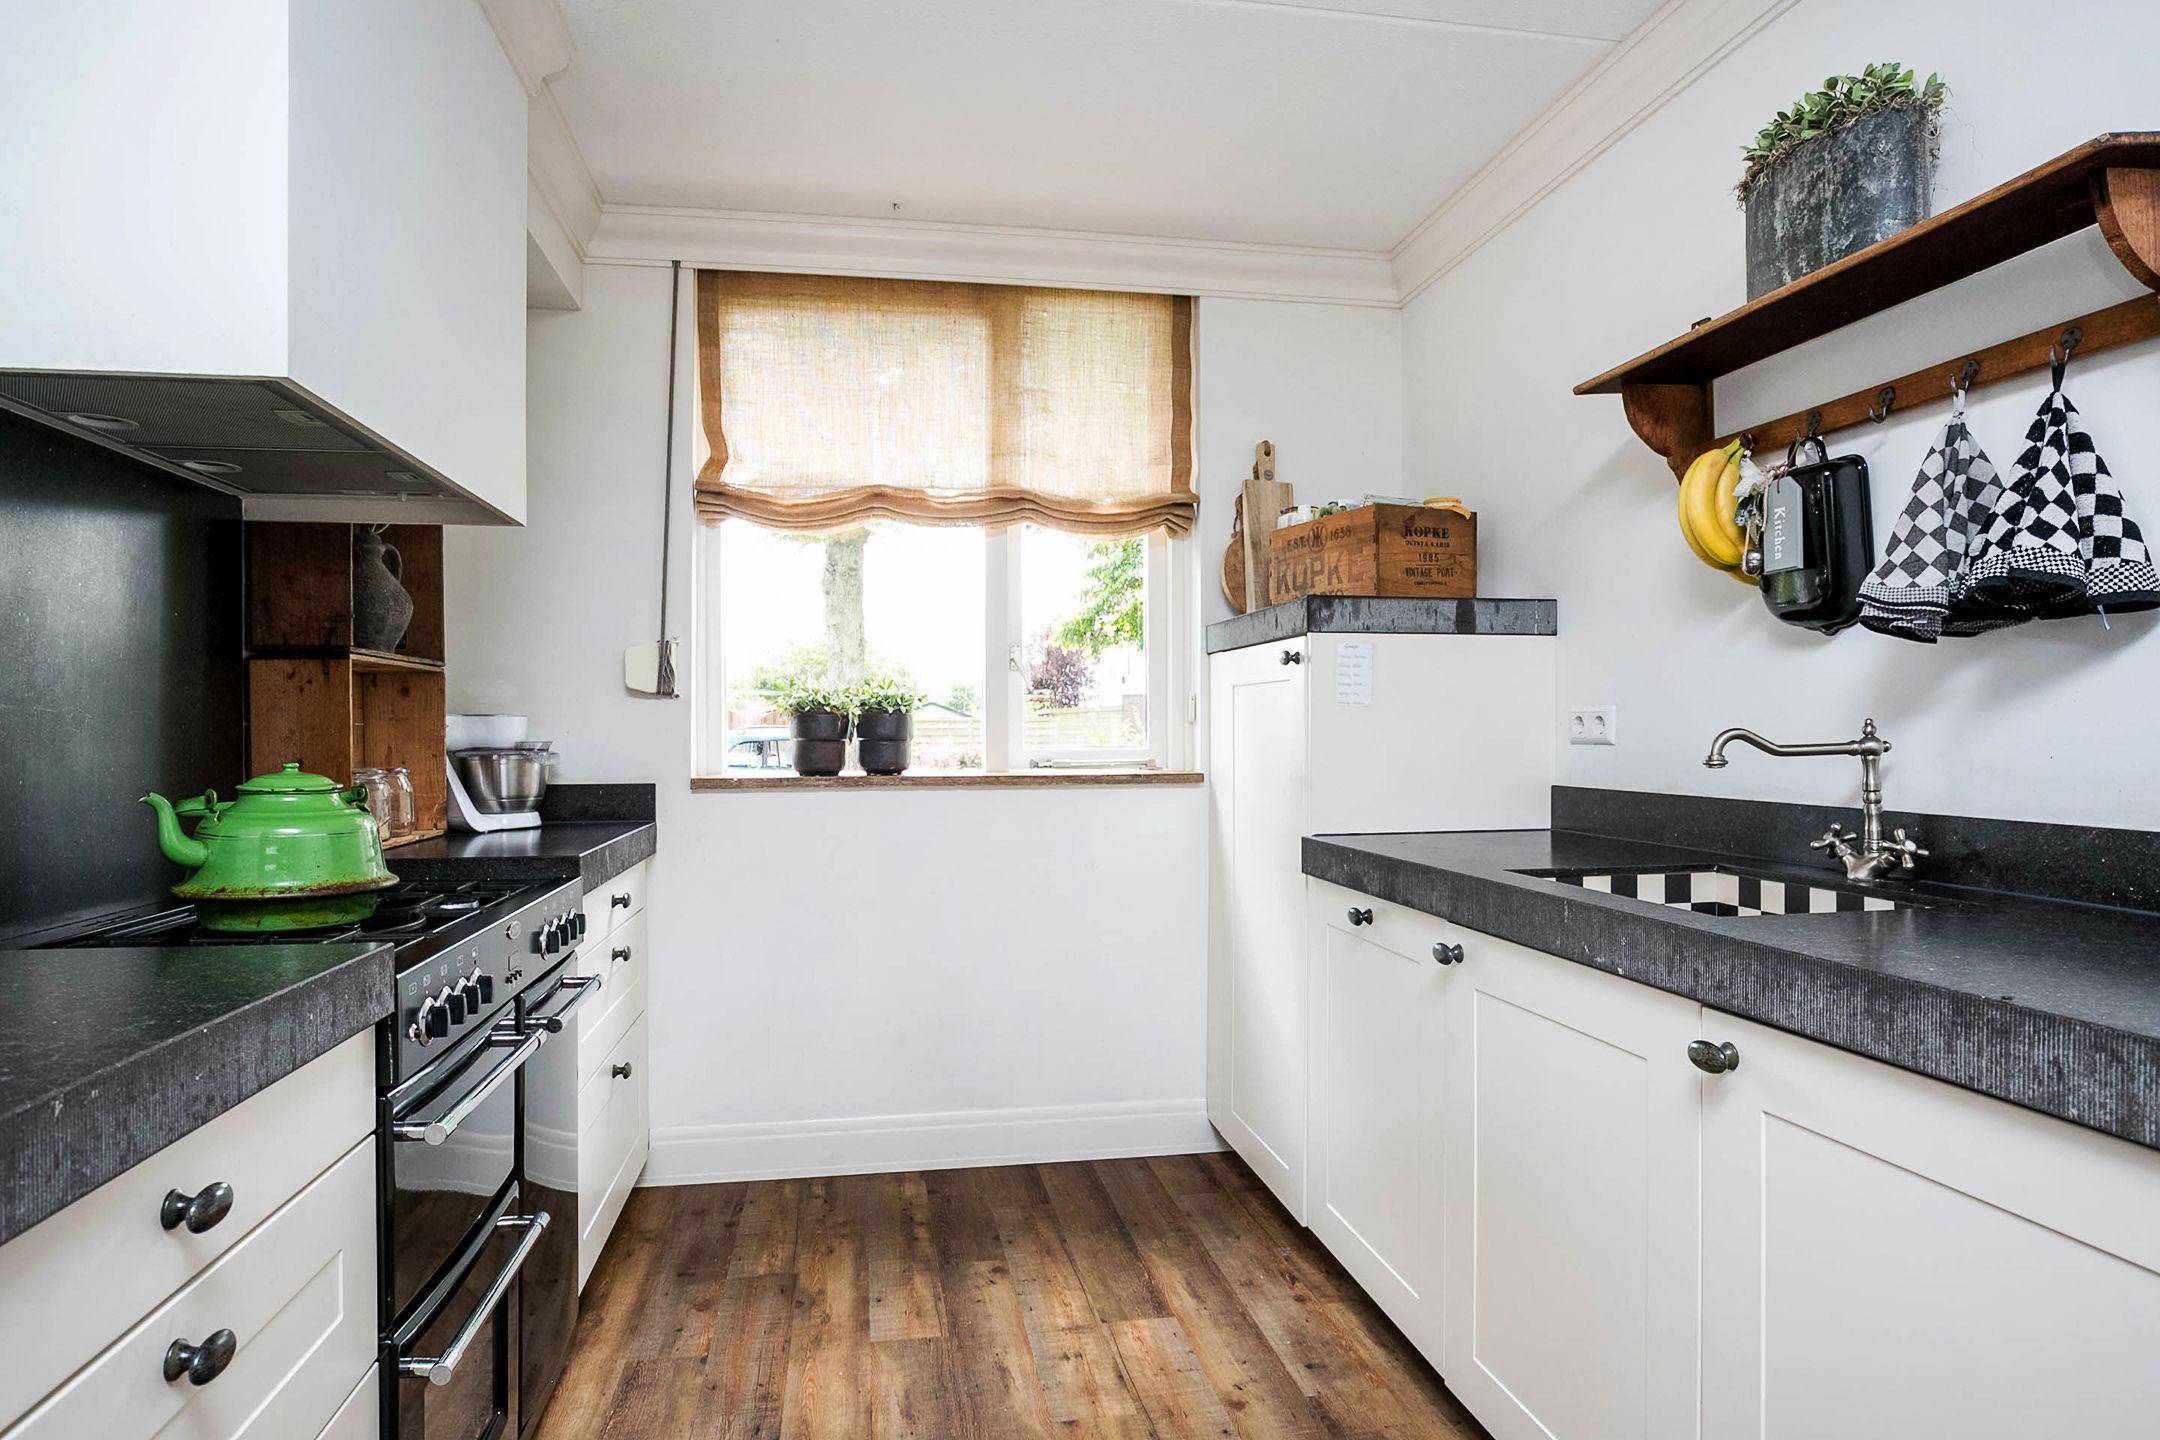 Stoere Keuken Wood : Stoere robuuste keuken luxe keukeninspiratie hoog design